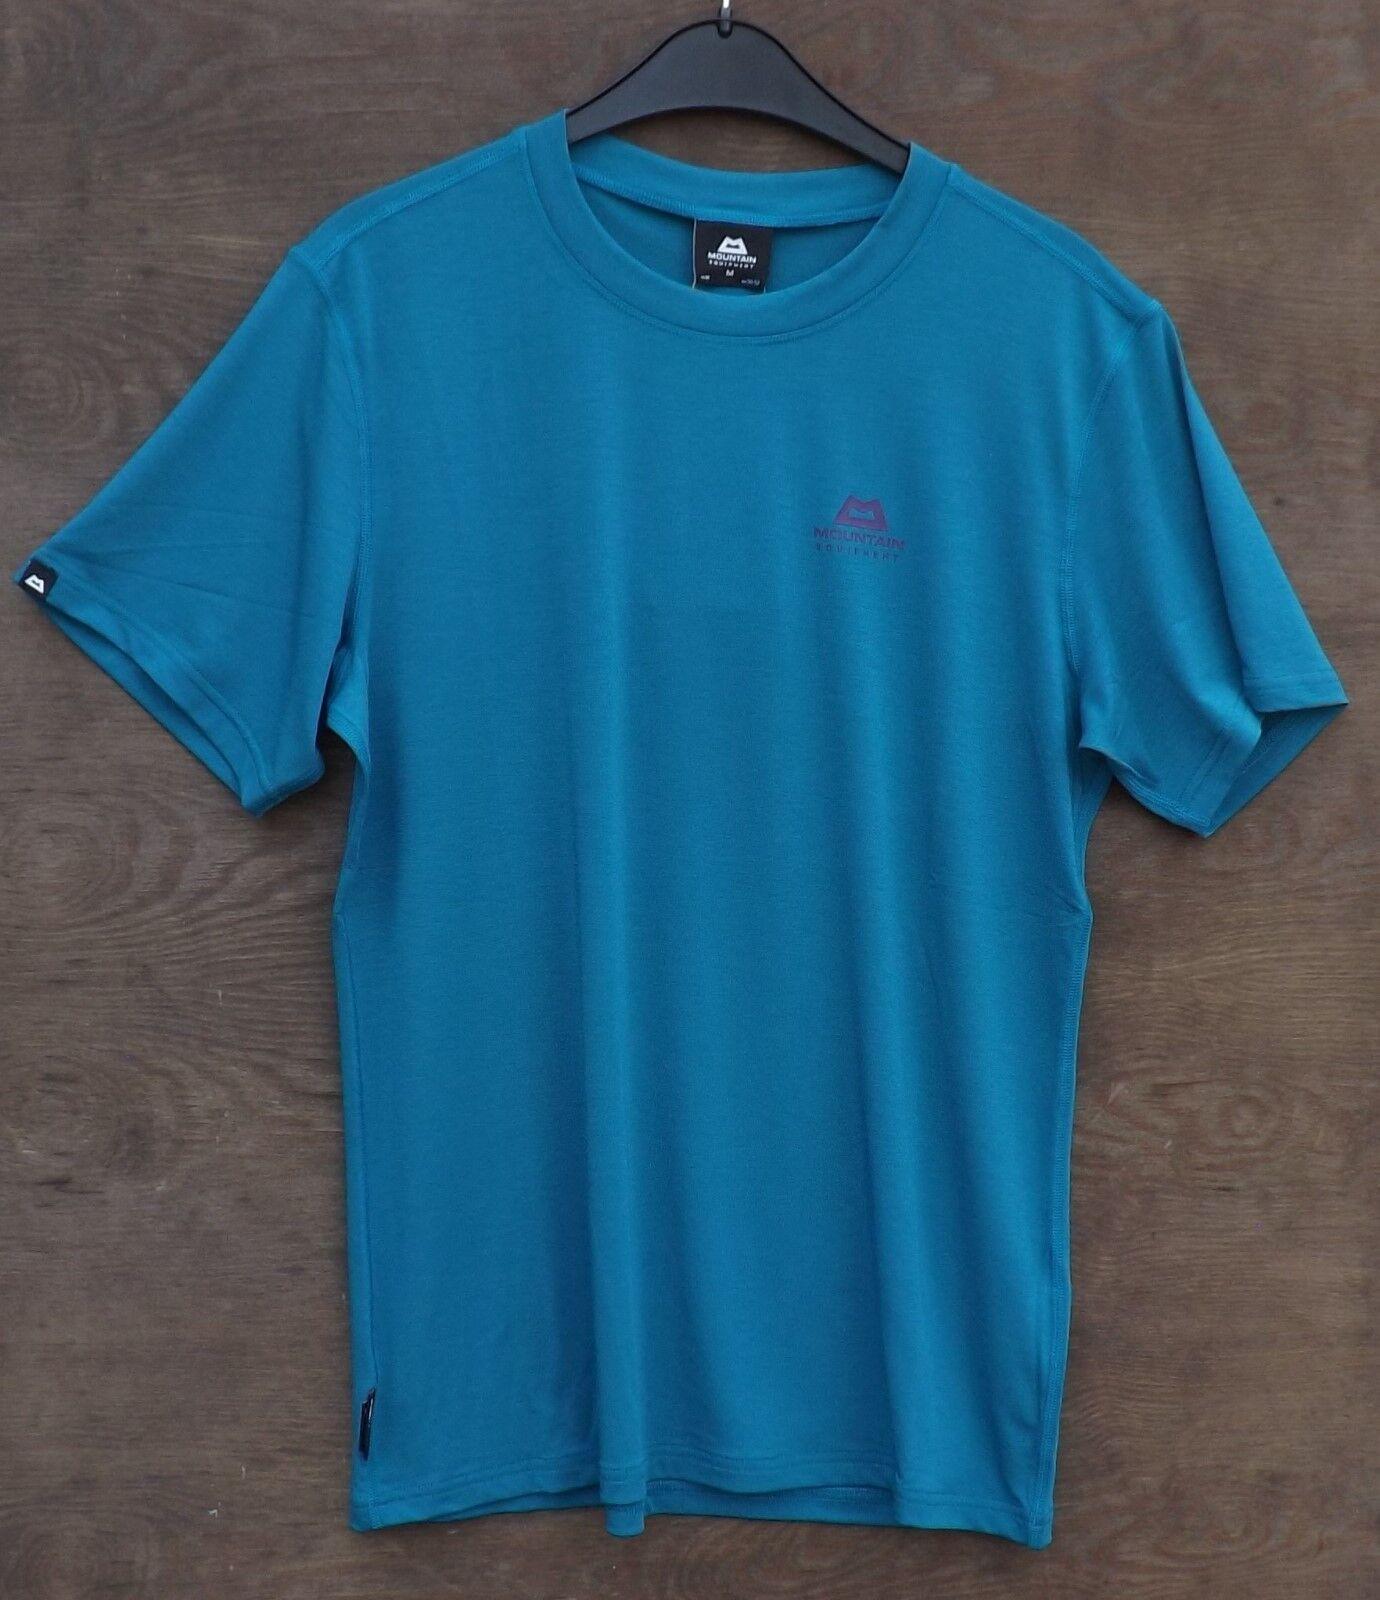 Mountain Groundup Equipment Groundup Mountain Tee Men, Herrenshirt, Funktionsshirt, tasman Blau c725bb